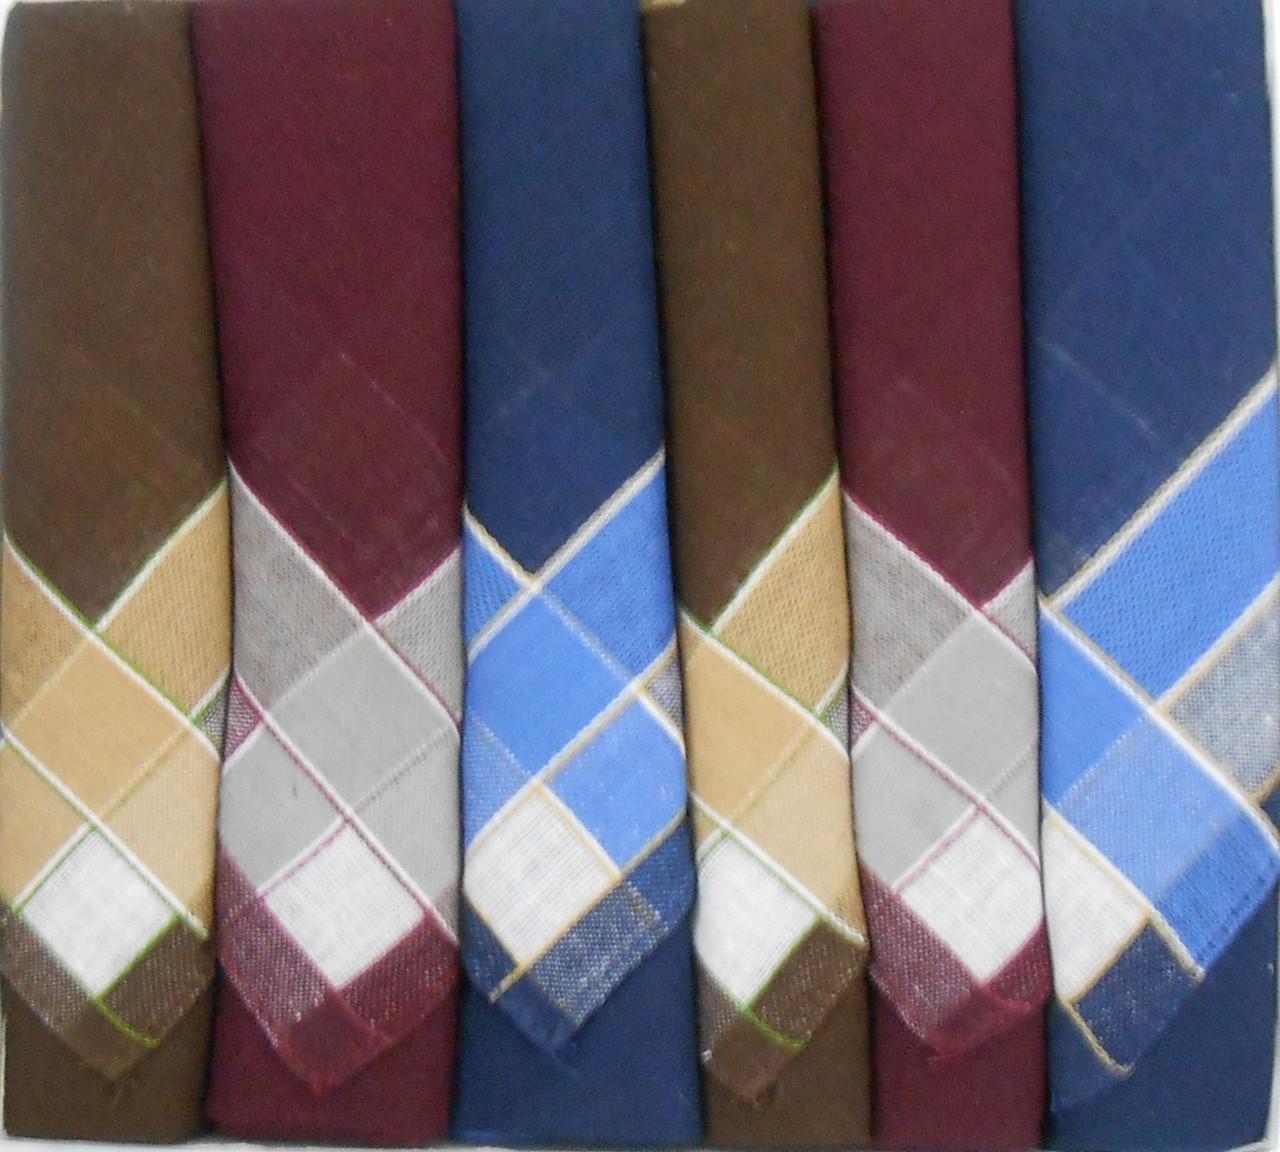 Набор мужских носовых платков Fazzoletto 100% хлопок Picalline